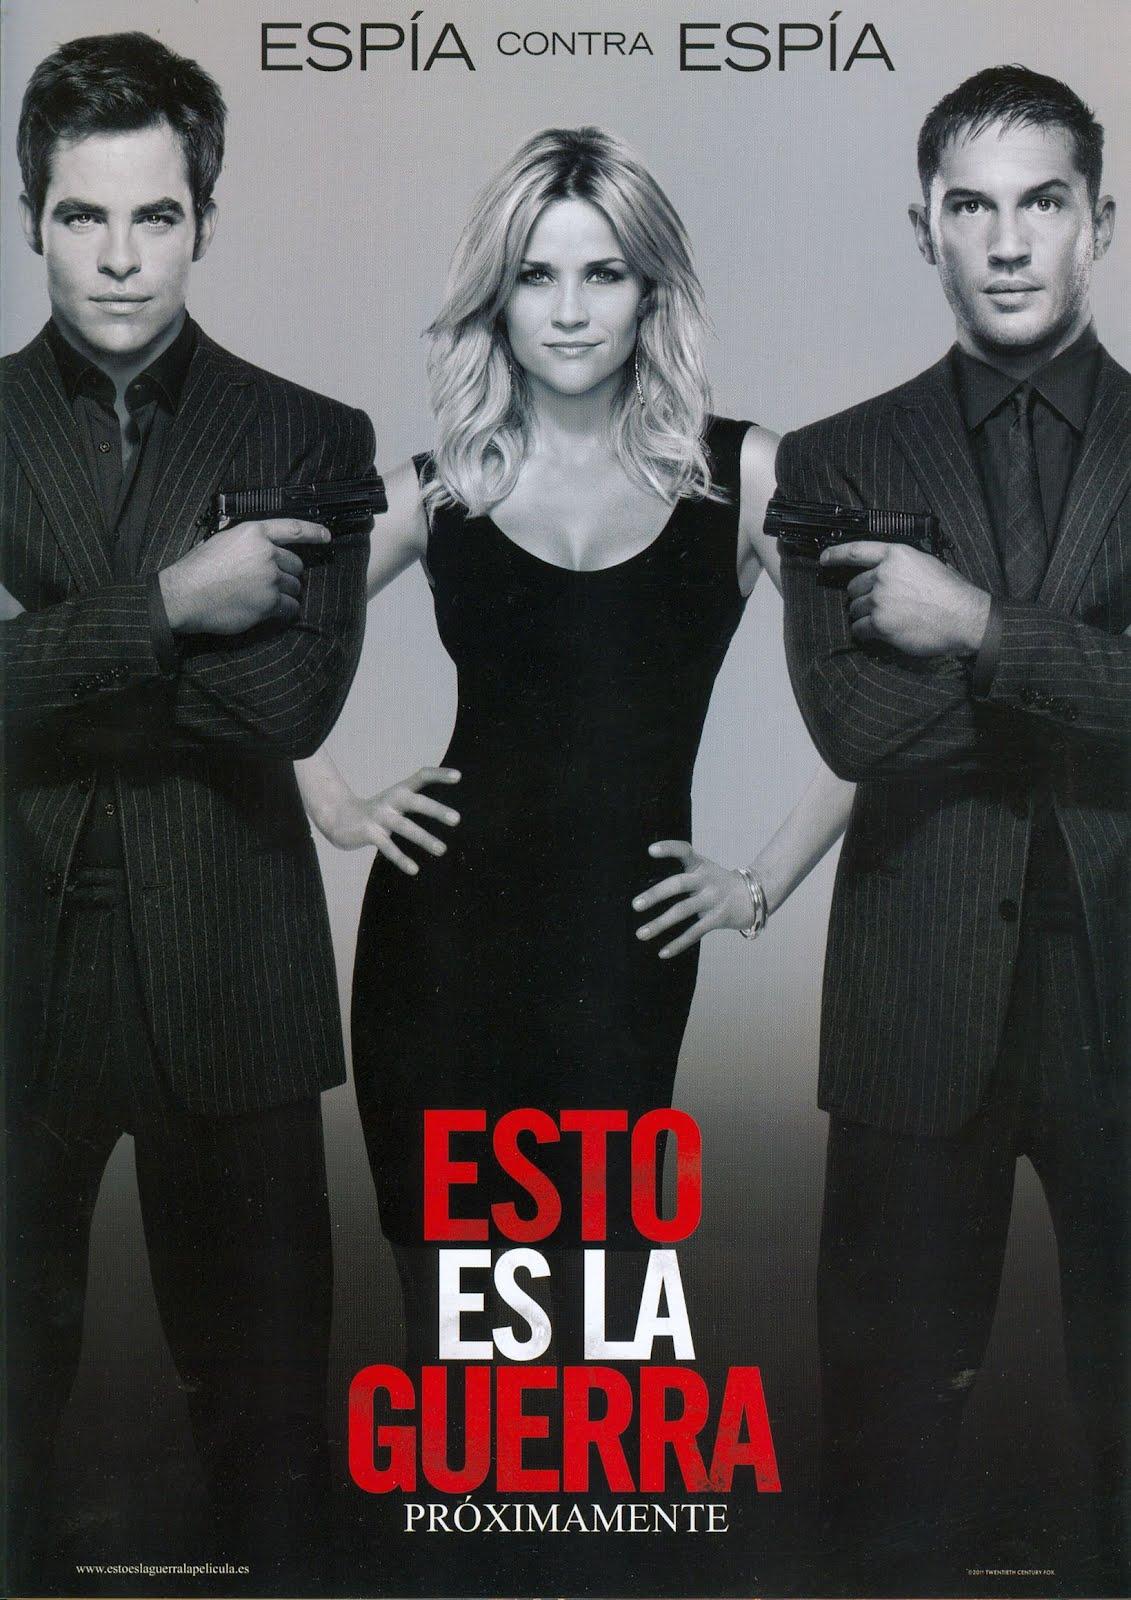 http://3.bp.blogspot.com/-KwYlz5wk6dU/T1Yh1va1MiI/AAAAAAAAHX4/-sIcPA5c0QQ/s1600/Esto-Es-La-Guerra-poster.jpg